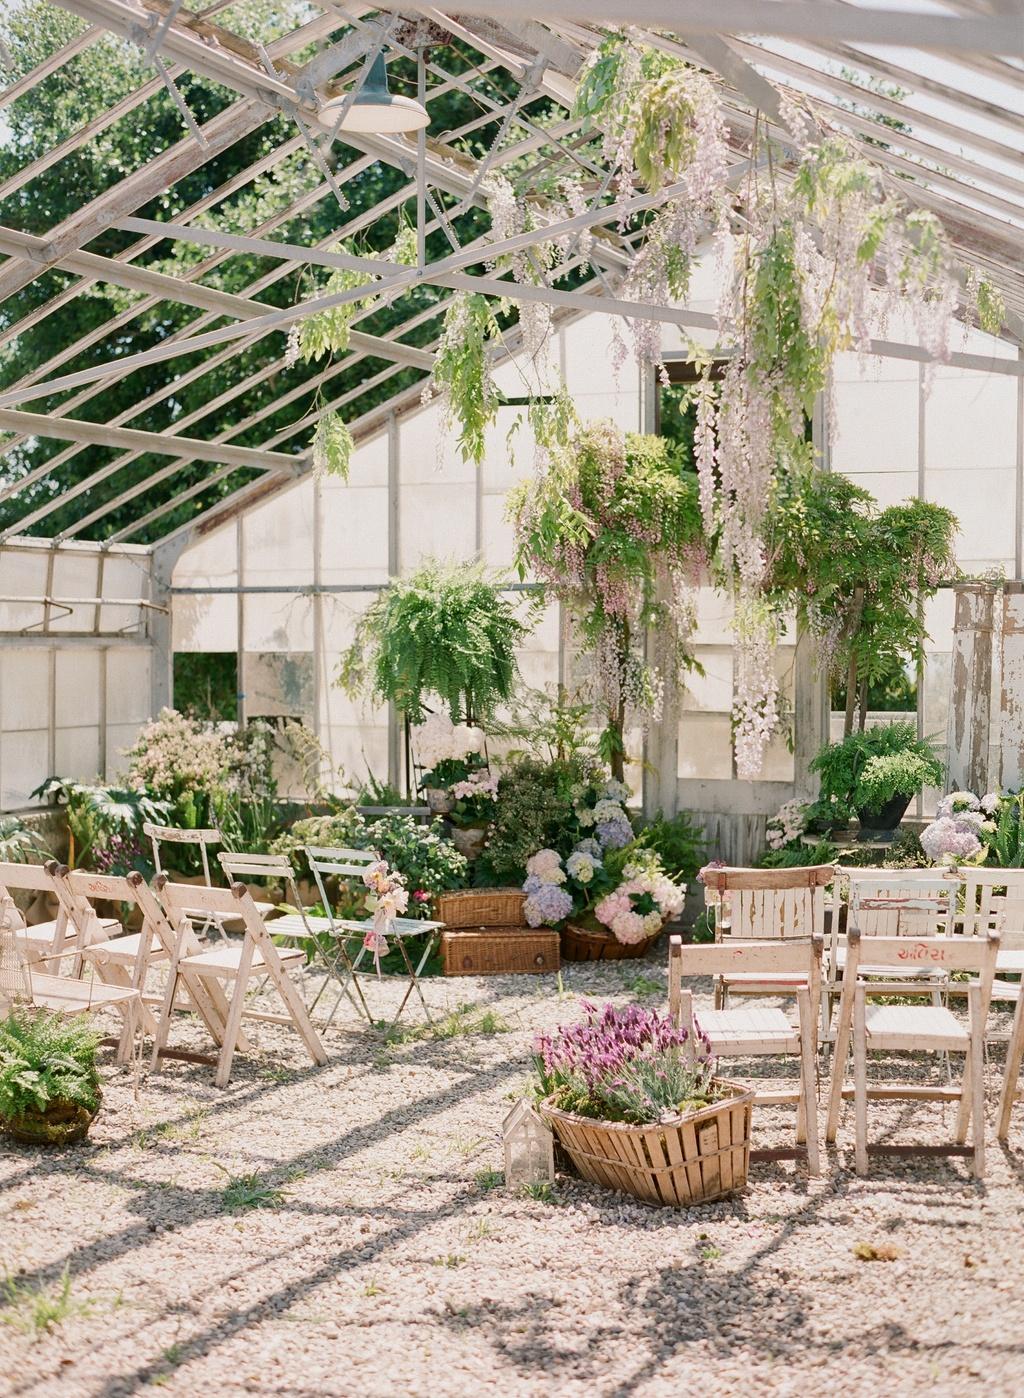 Styled-wedding-beaux-arts-tea-time-monique-lhuillier-santa-barbara-chic-flowers-venue-15.full